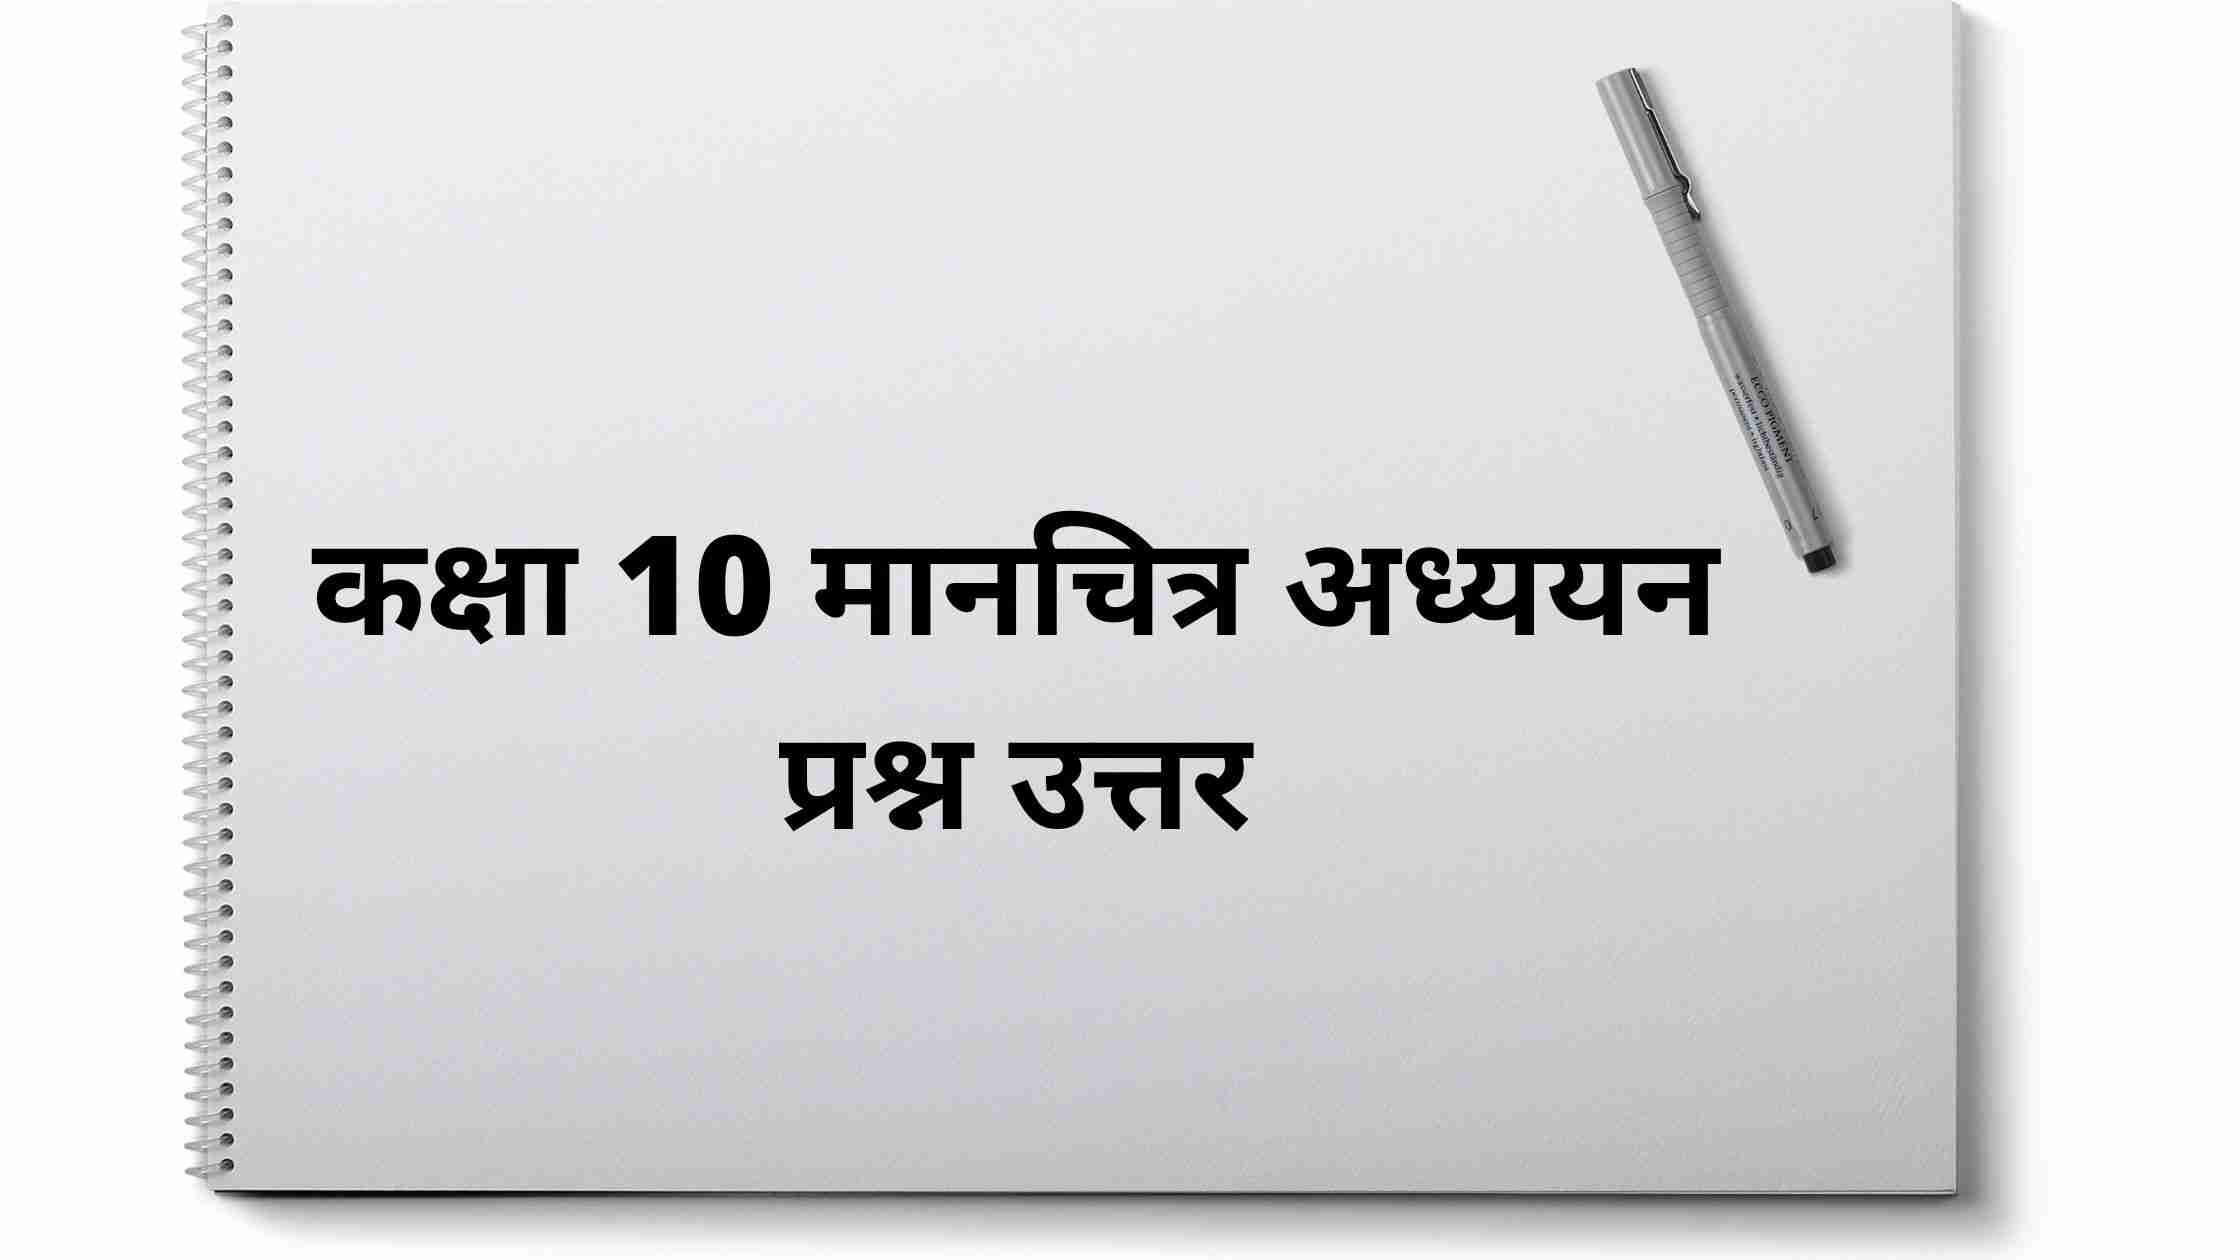 Manchitra adhyayan prashn